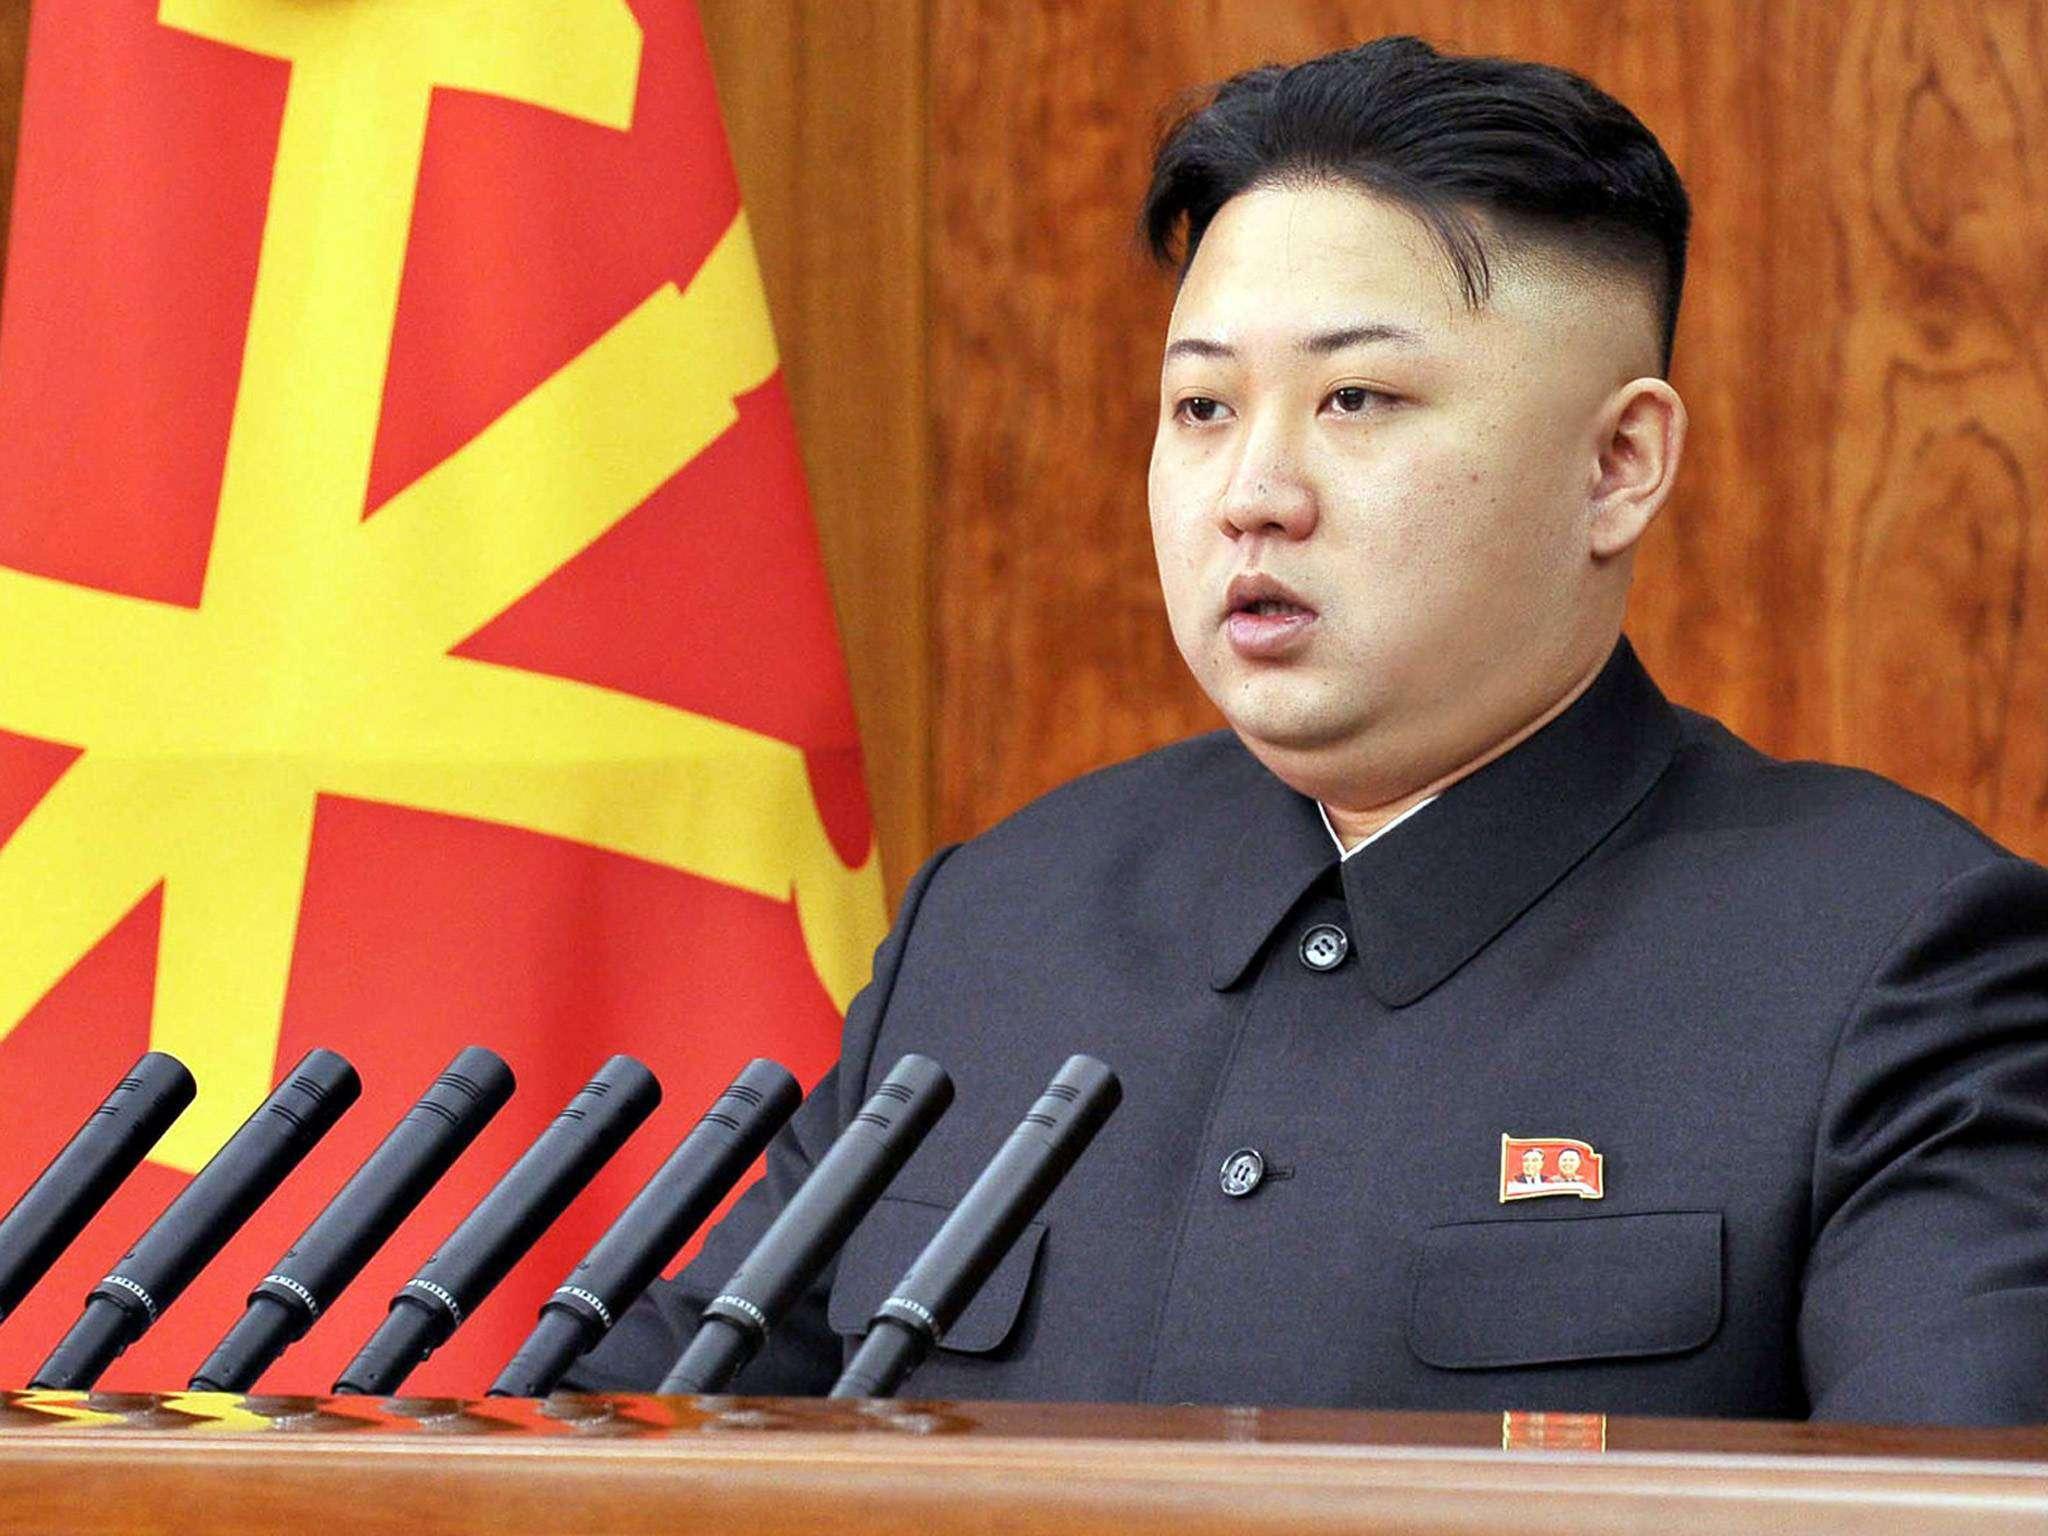 Kim Jong Un Foto: GETTY